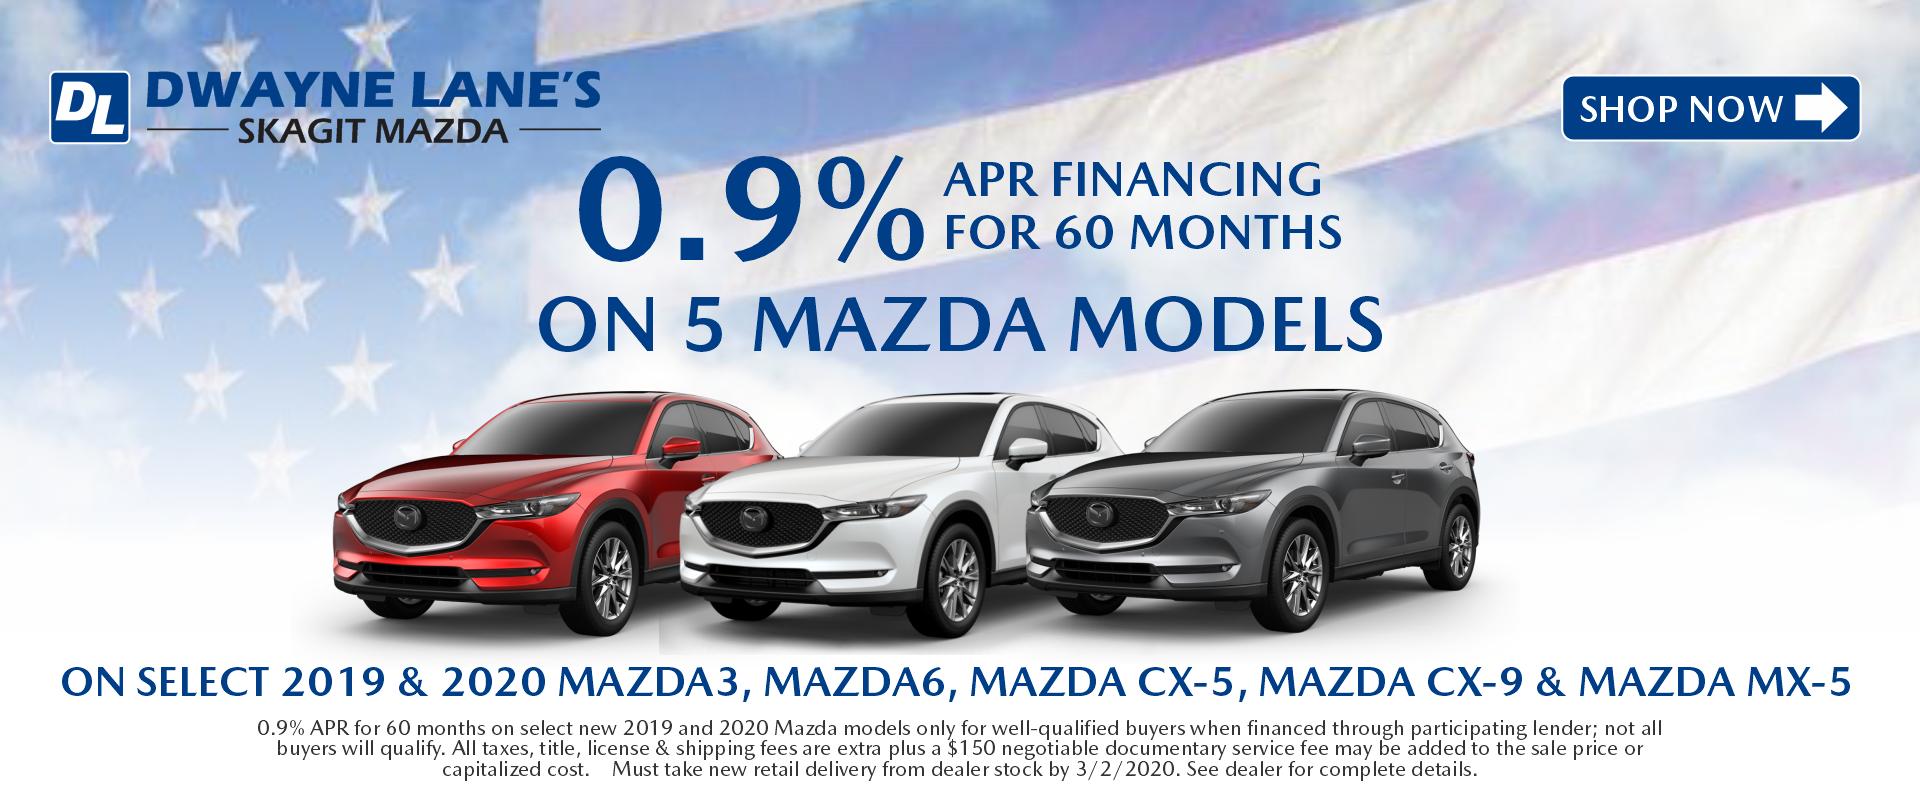 Dwayne Lane's Skagit Mazda - 0.9% APR on 5 models